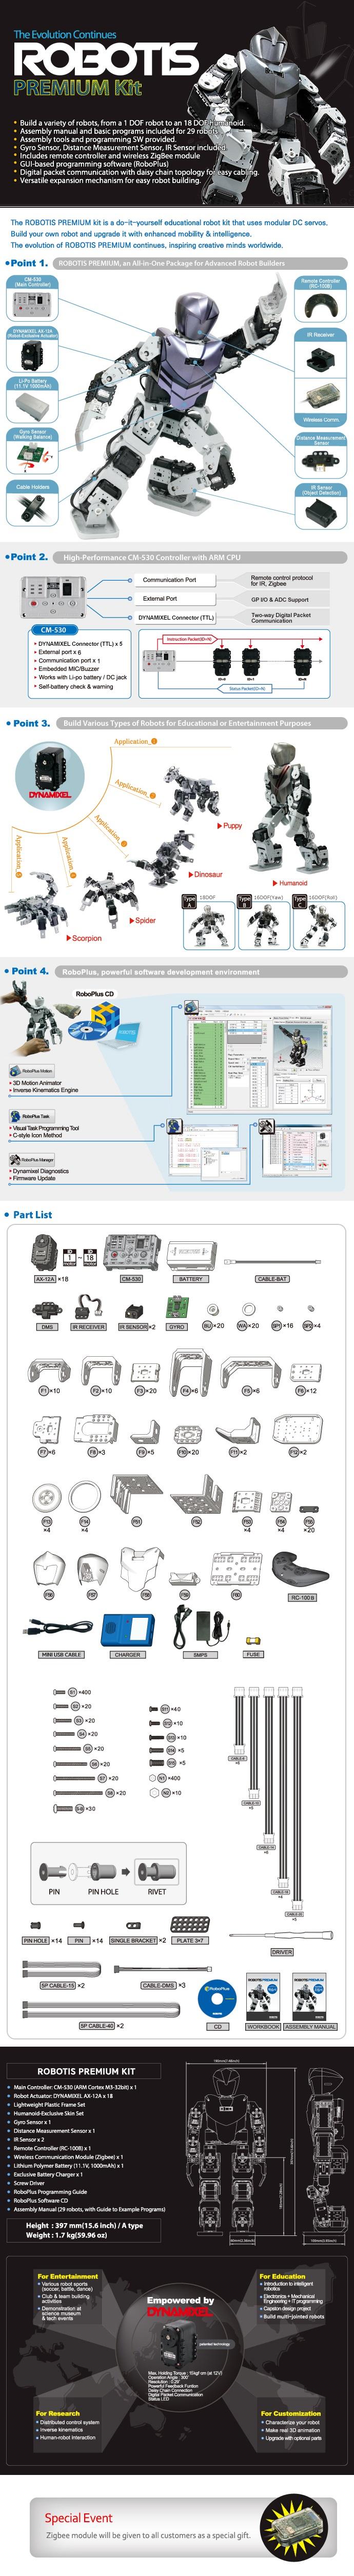 robotis-premium-info.jpg